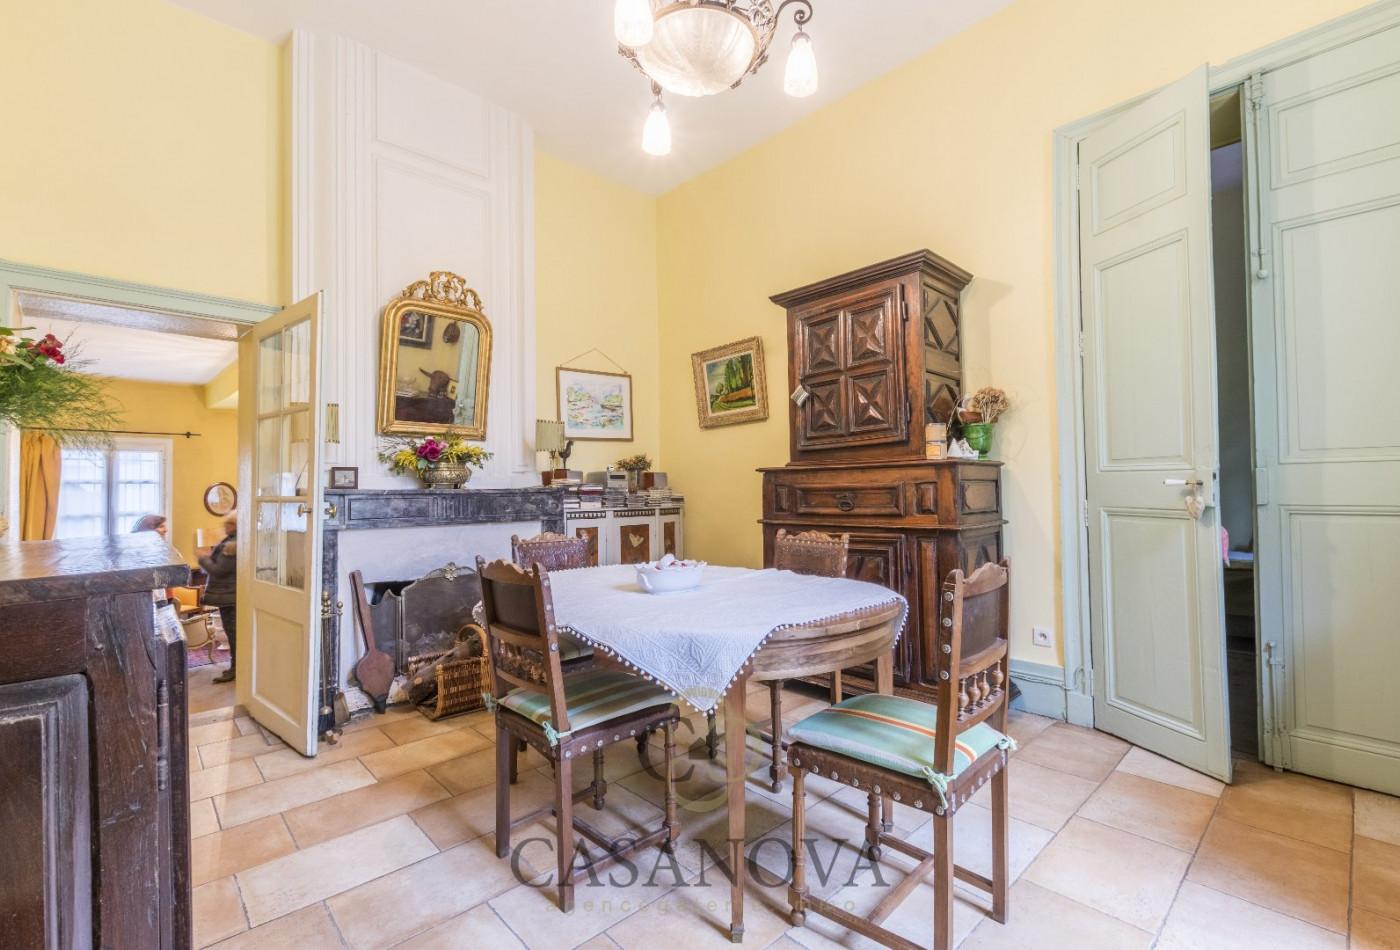 A vendre Montpellier 340147945 Agence galerie casanova